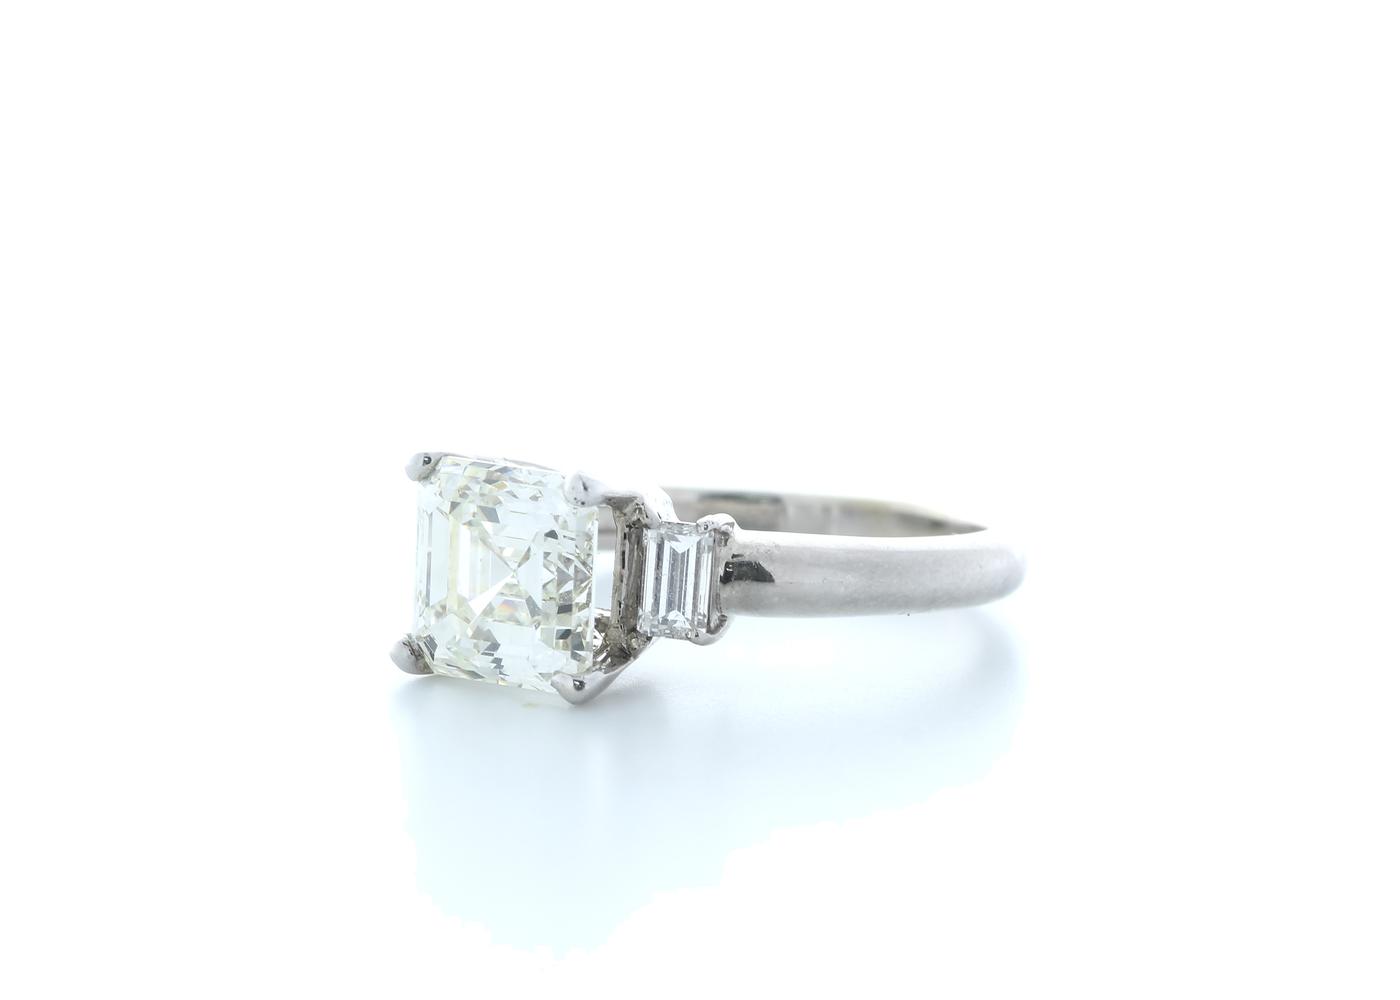 18ct White Gold Three Stone Claw Set Diamond Ring 3.11(2.70) Carats - Image 2 of 5